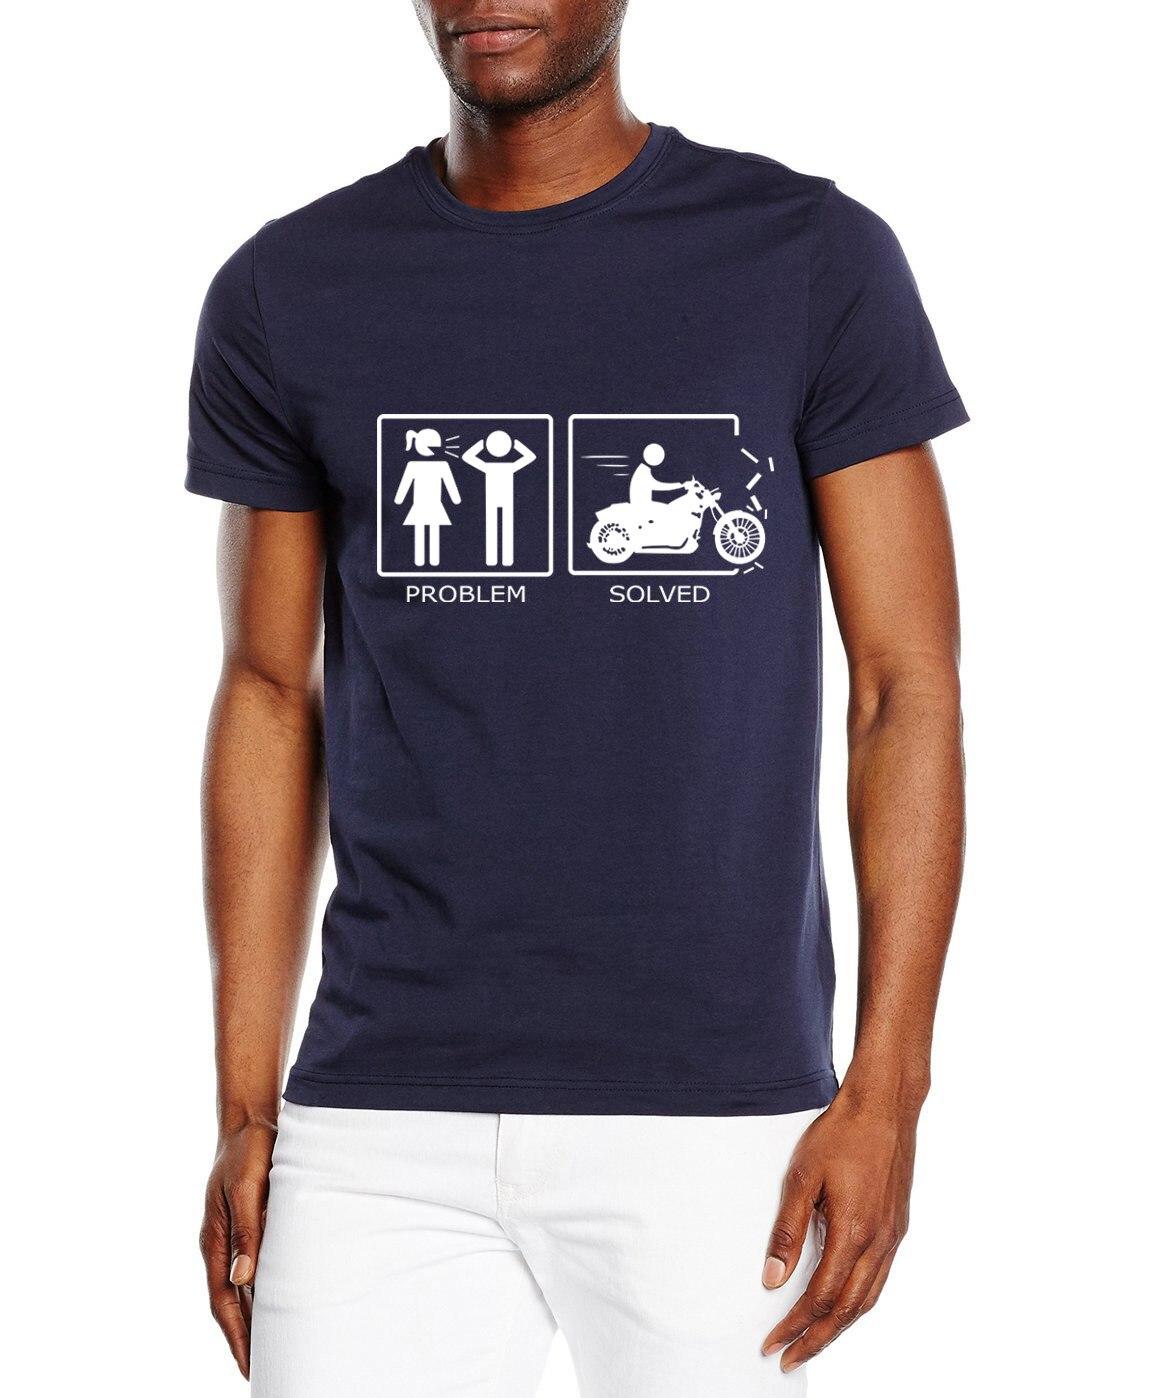 cotton casual t shirt men short sleeve black motorcycle Problem novelty printing man's crossfit t shirts streetwear homme shirt men s casual short sleeve printing black t shirt